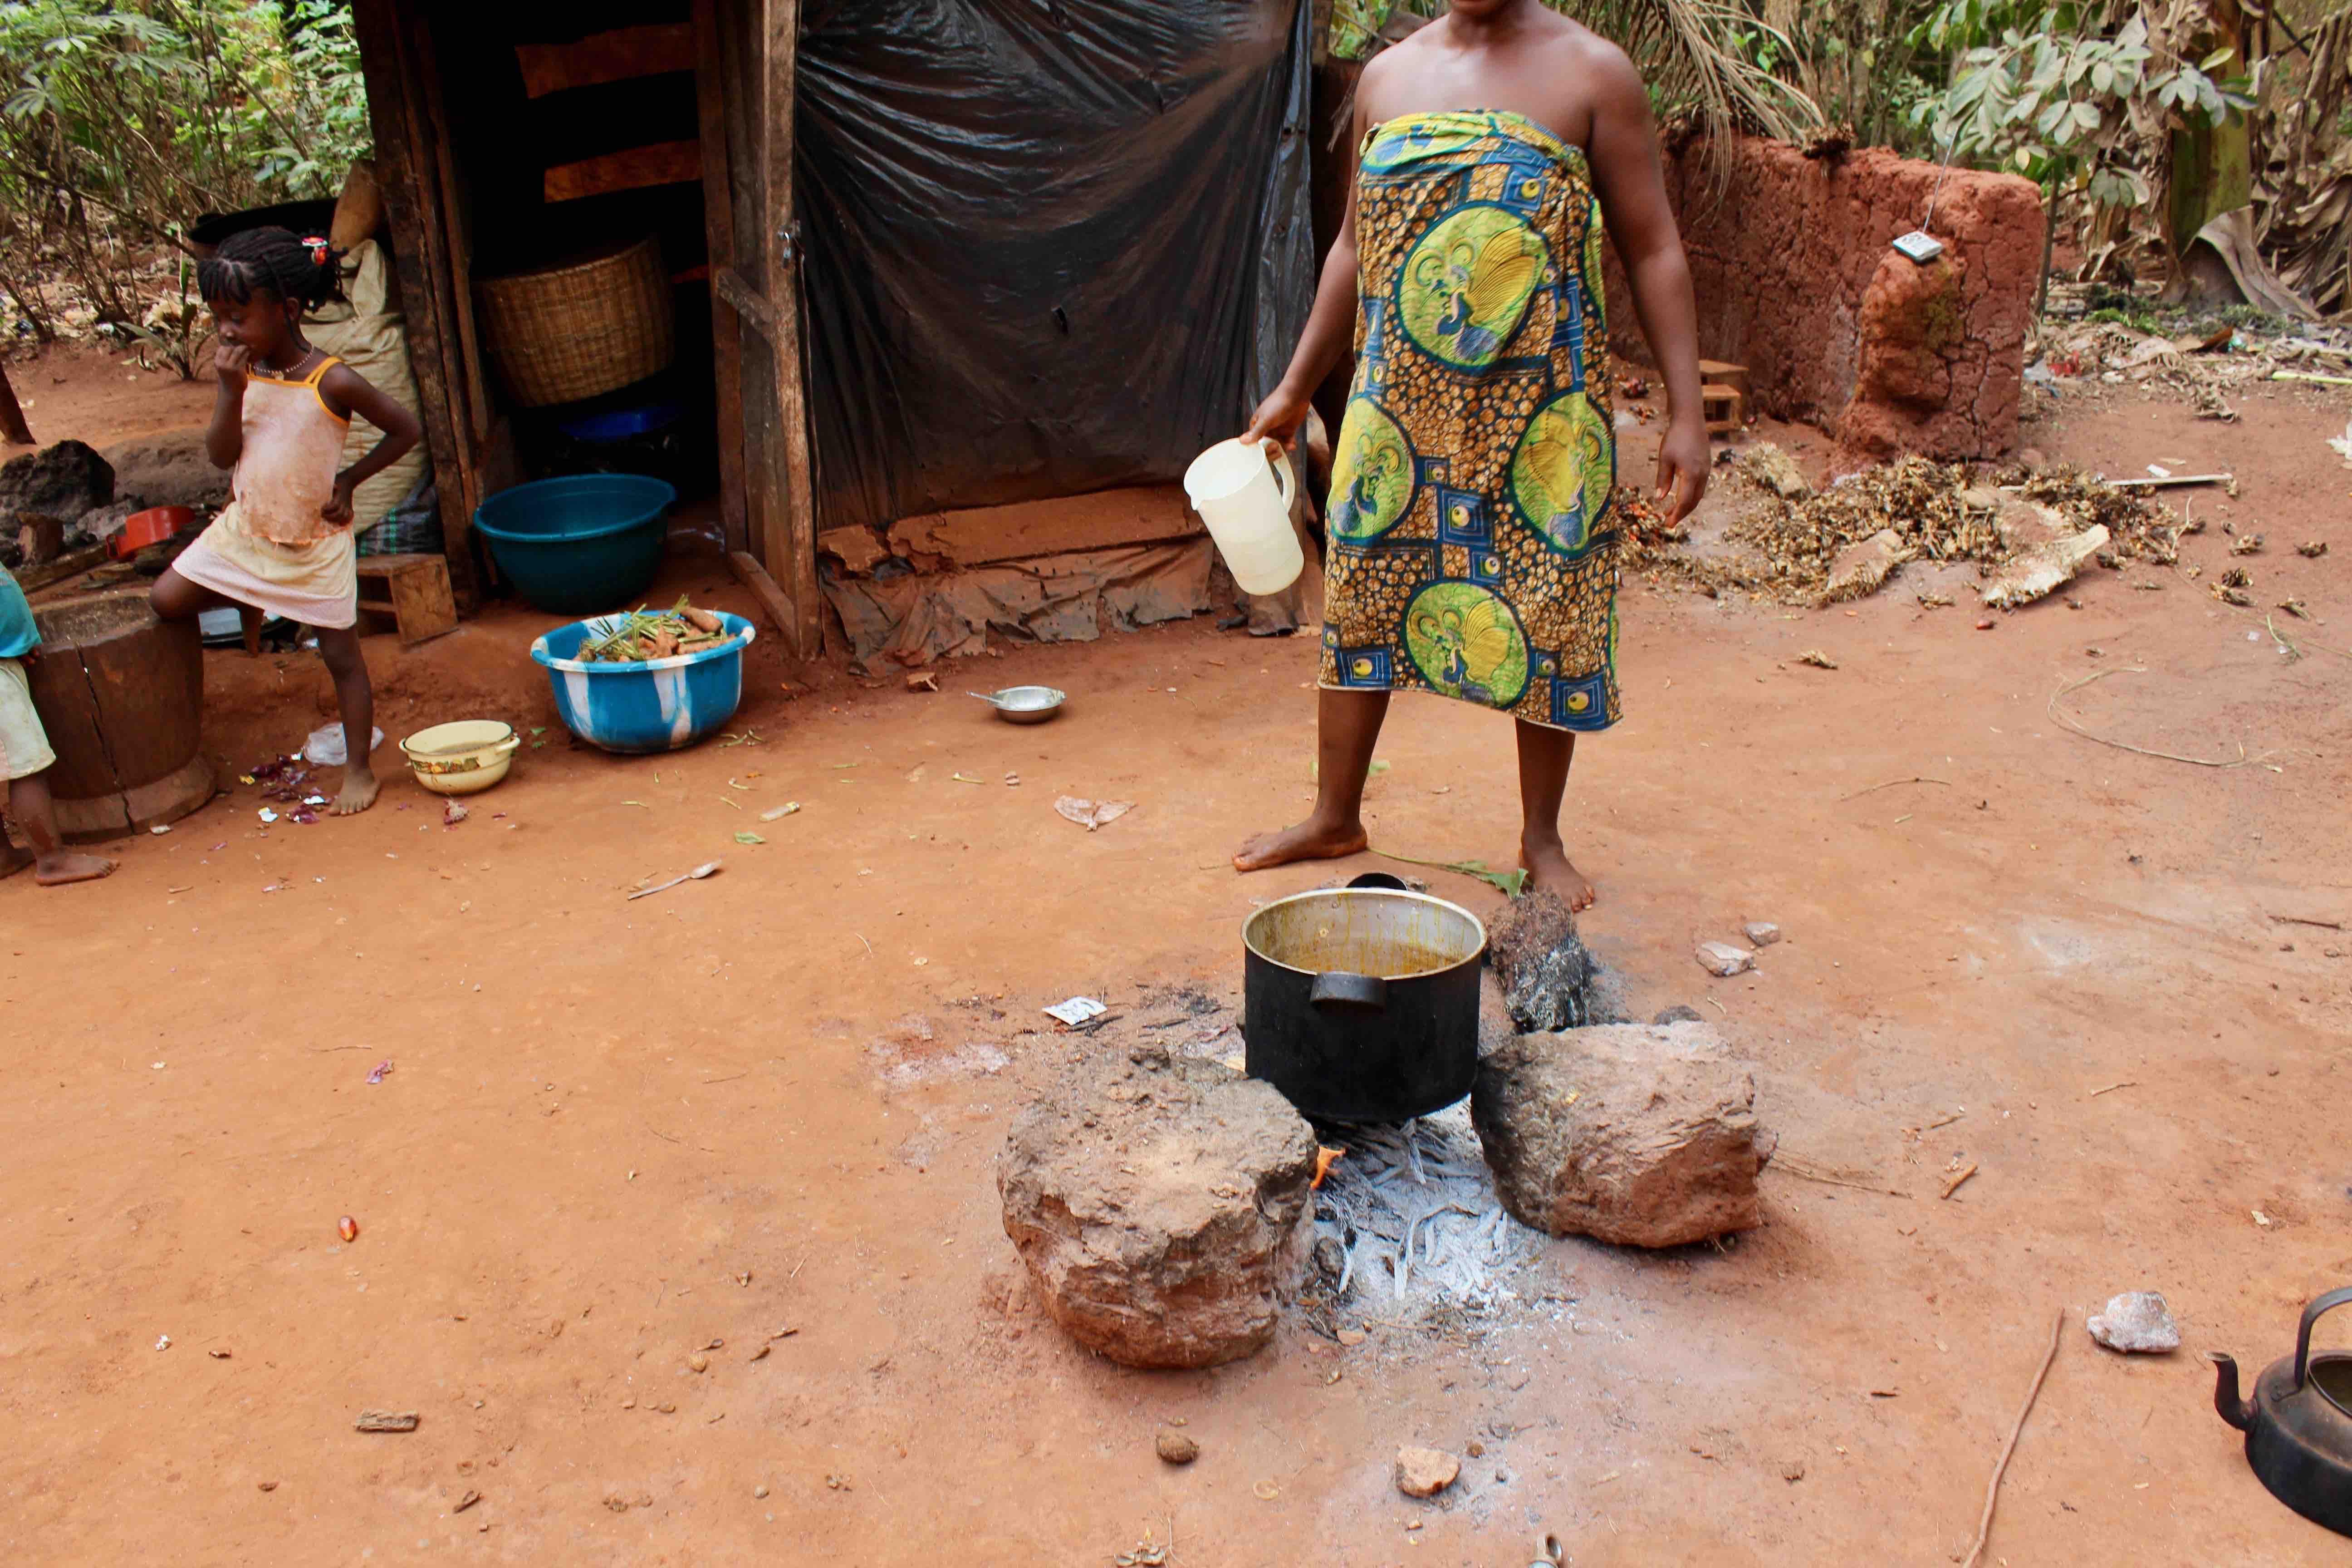 Igbo woman cooking ogbono soup, Iheaka Village, Enugu State, Nigeria. #JujuFilms